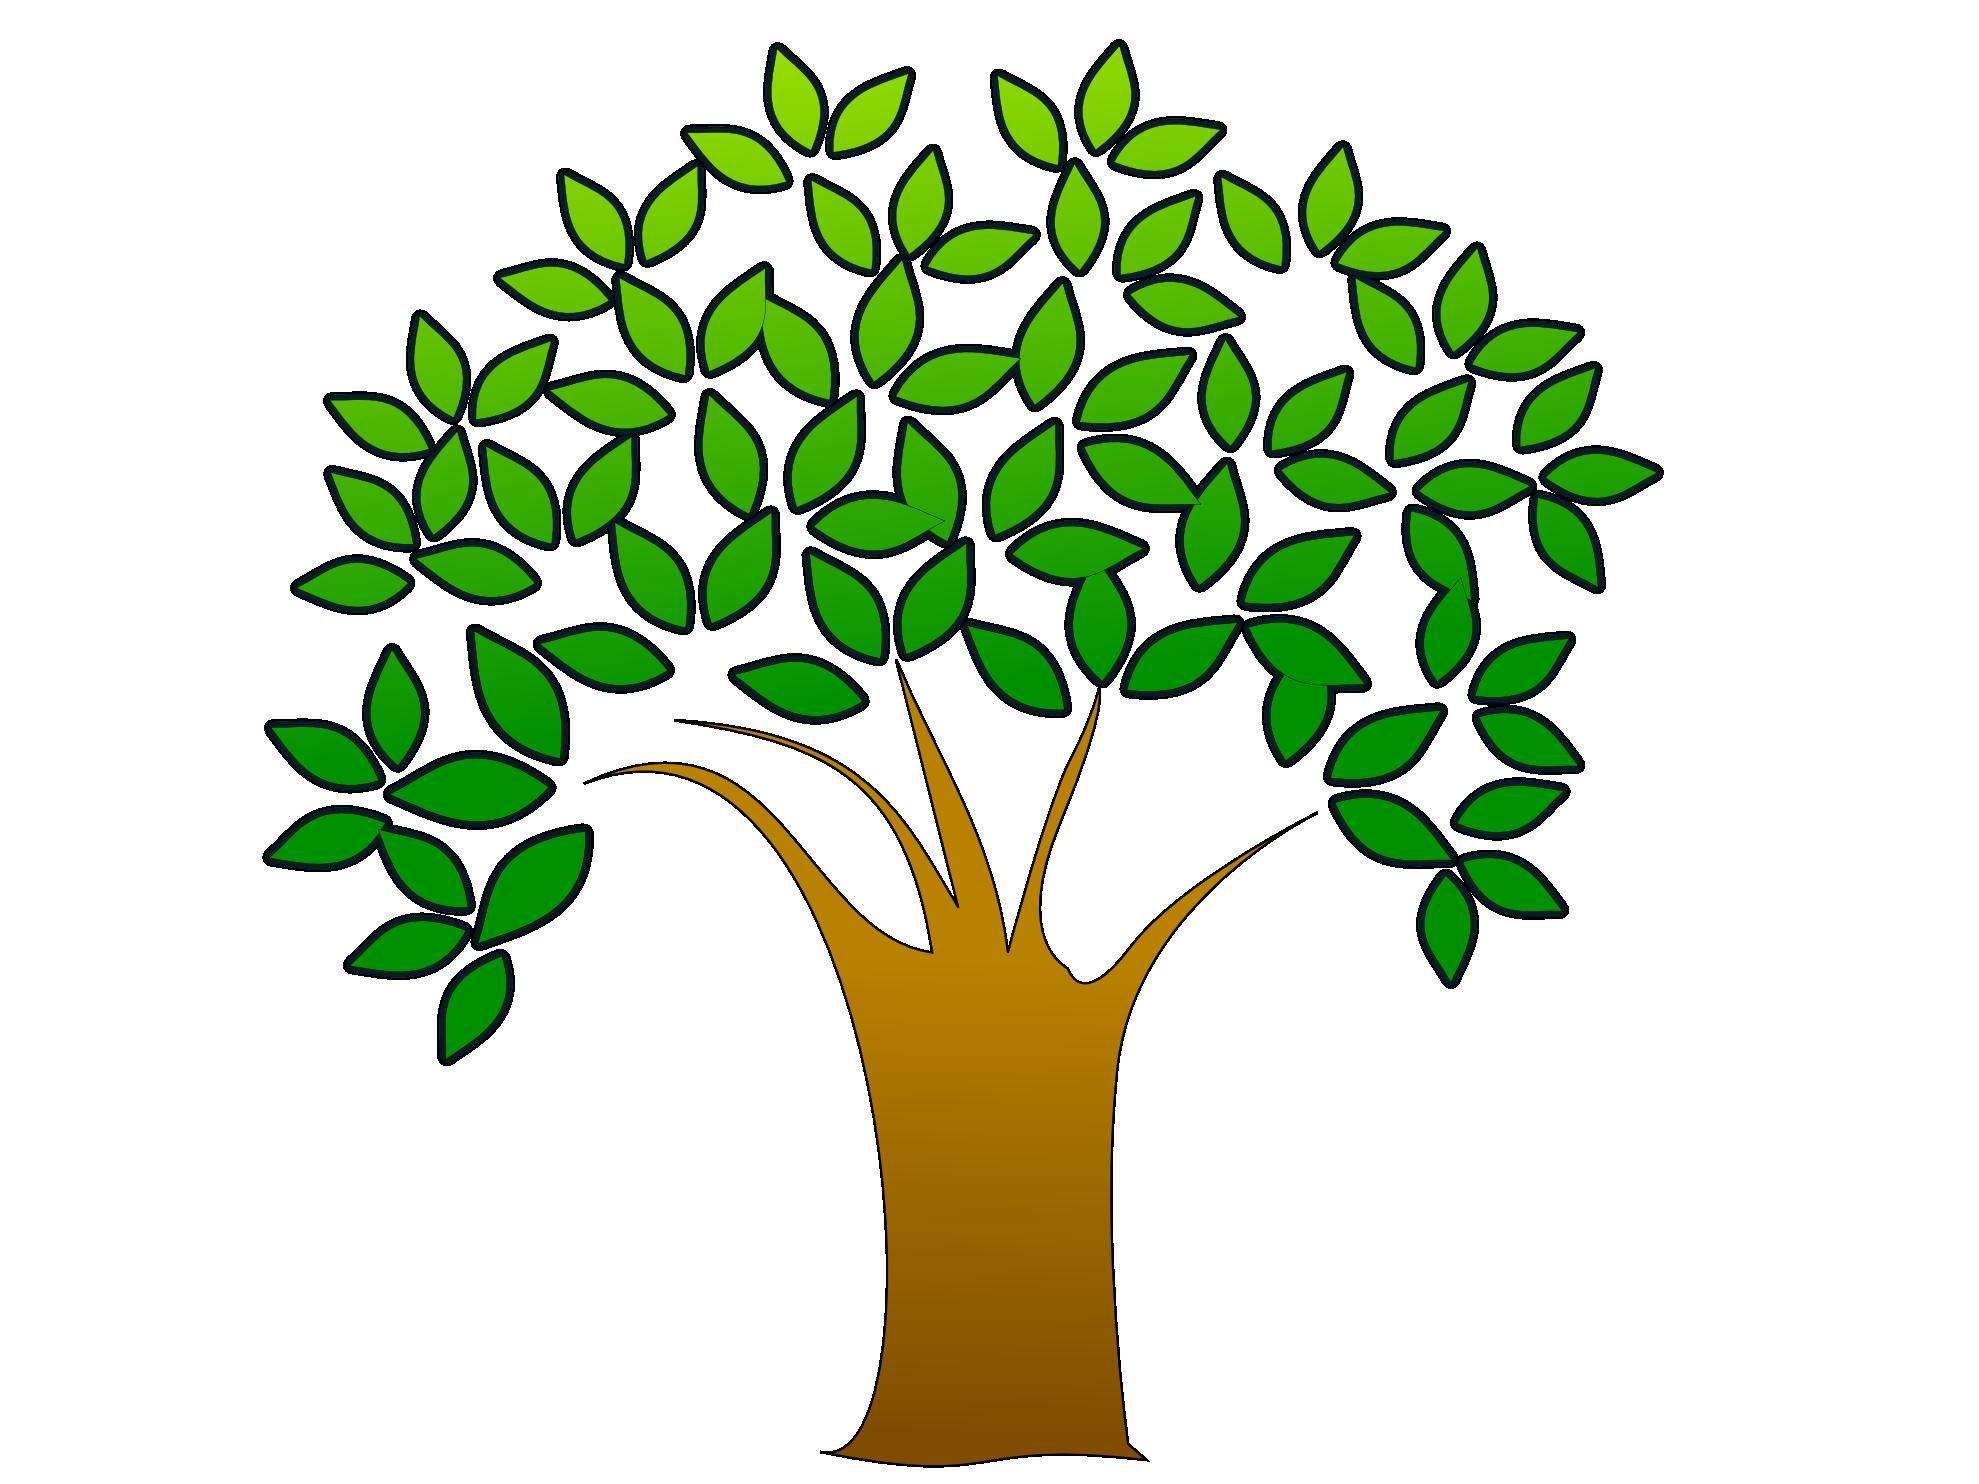 clipart-tree-jTxb7ELTE.png